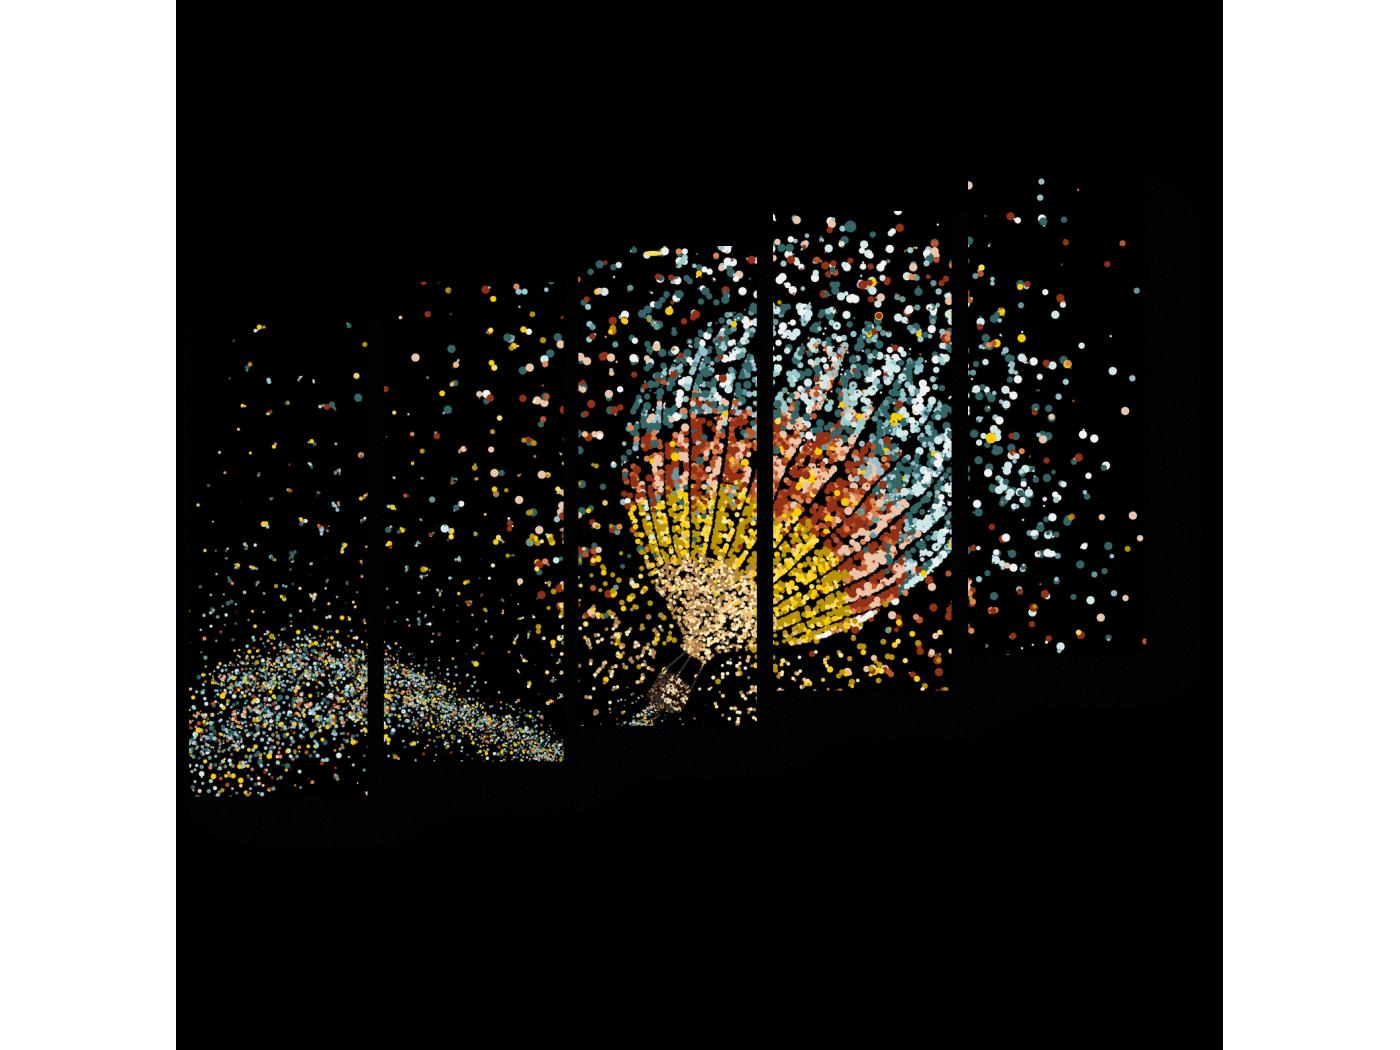 Модульная картина Сияющий воздушный шар (90x63) фото